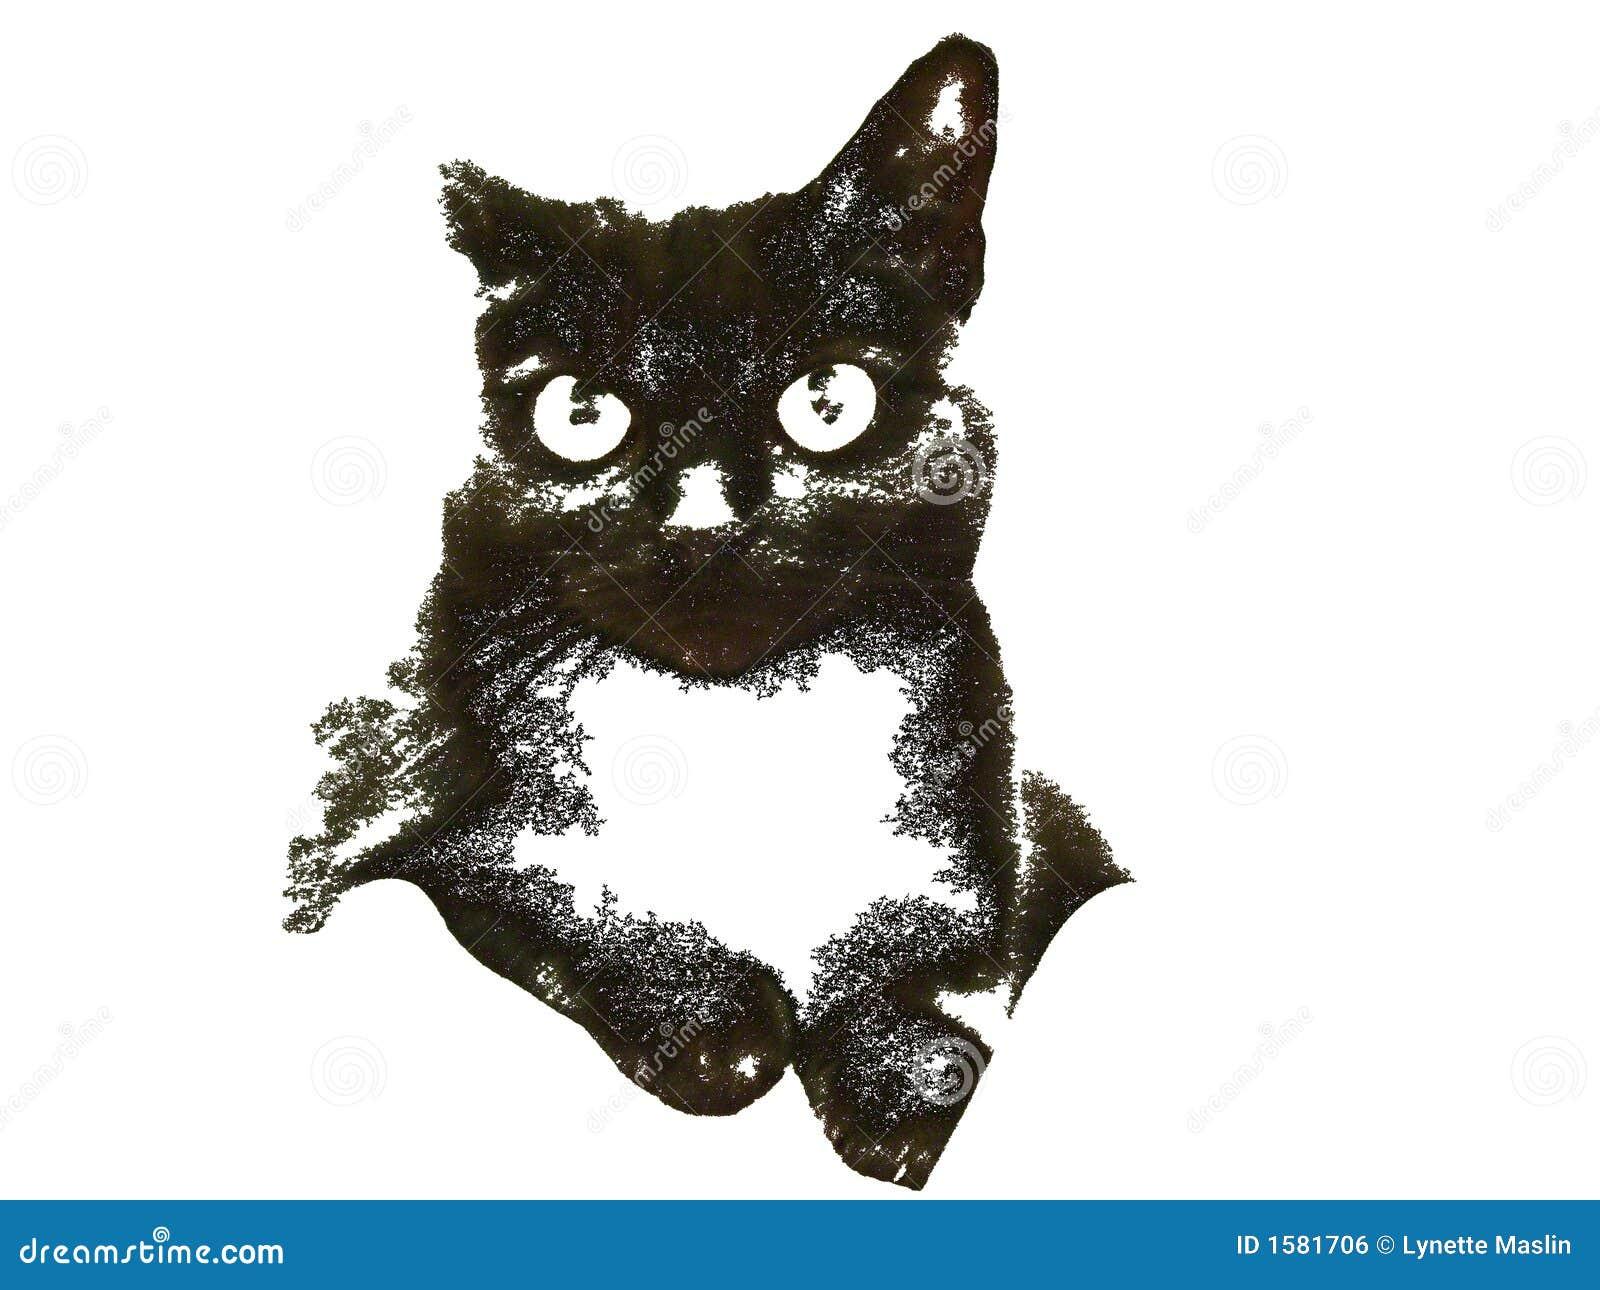 the black cat edgar allan poe analysis essay